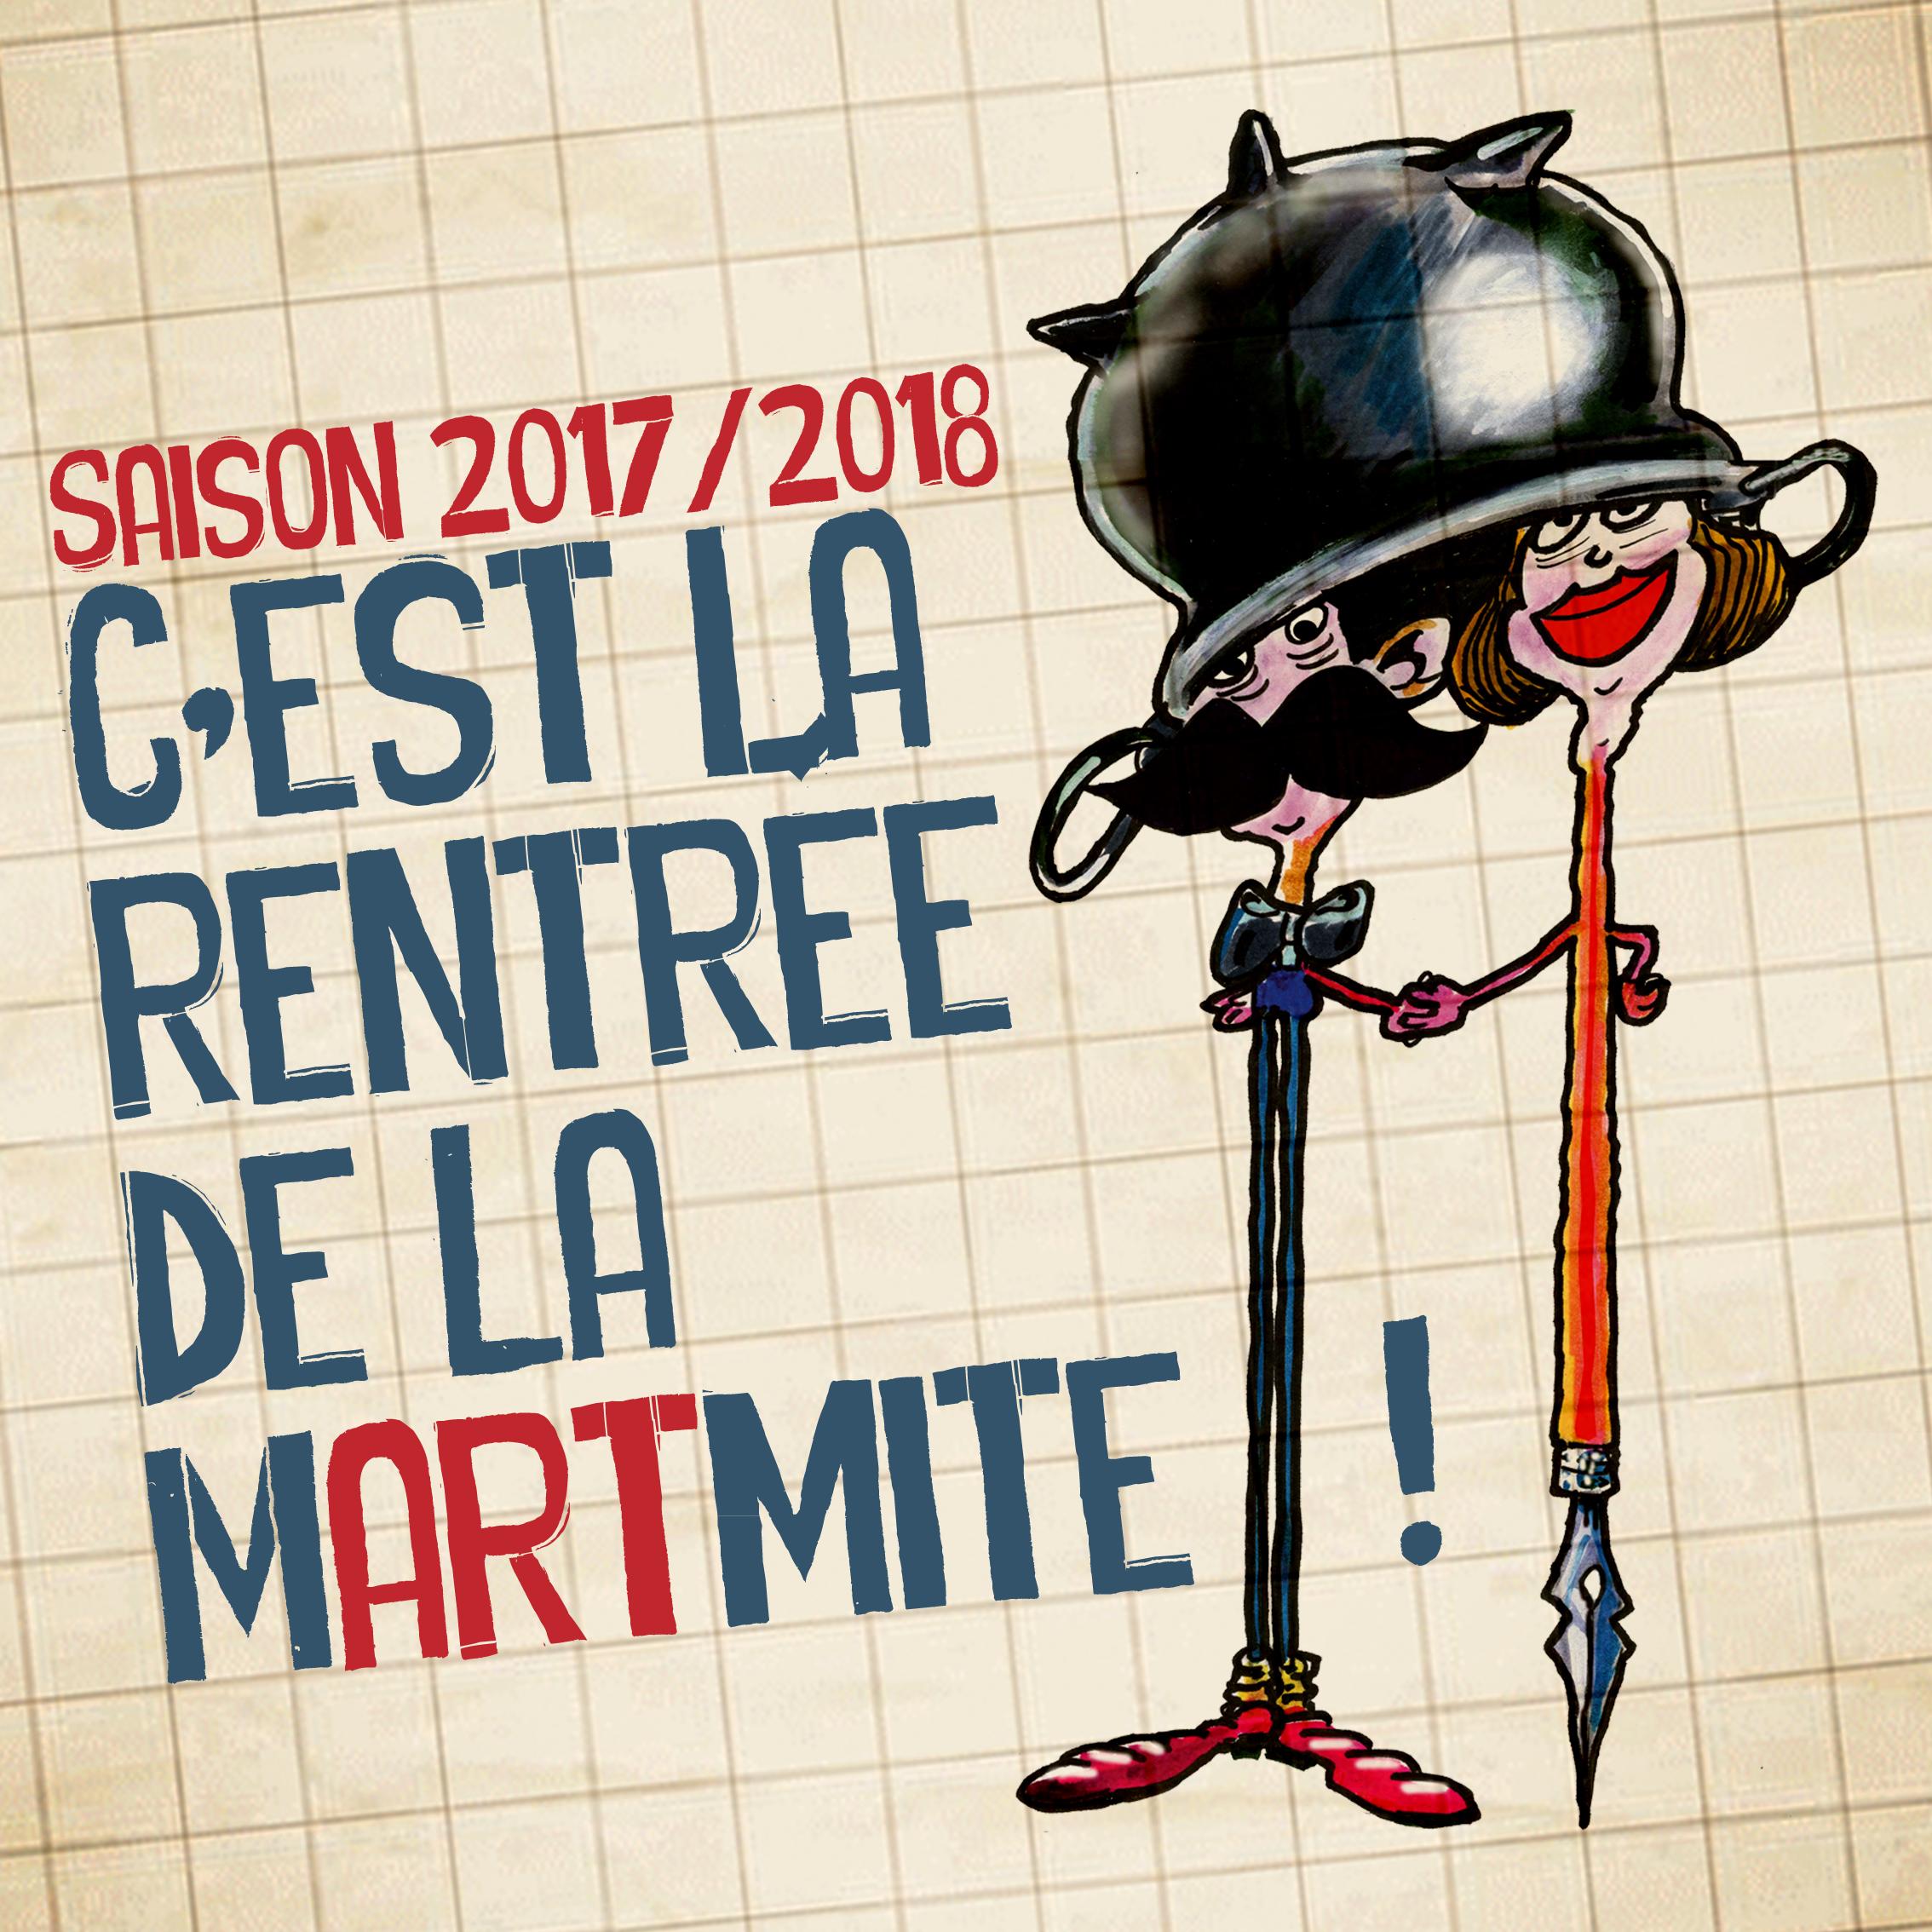 Rentree_saison20172018_LaMartmite_800x800